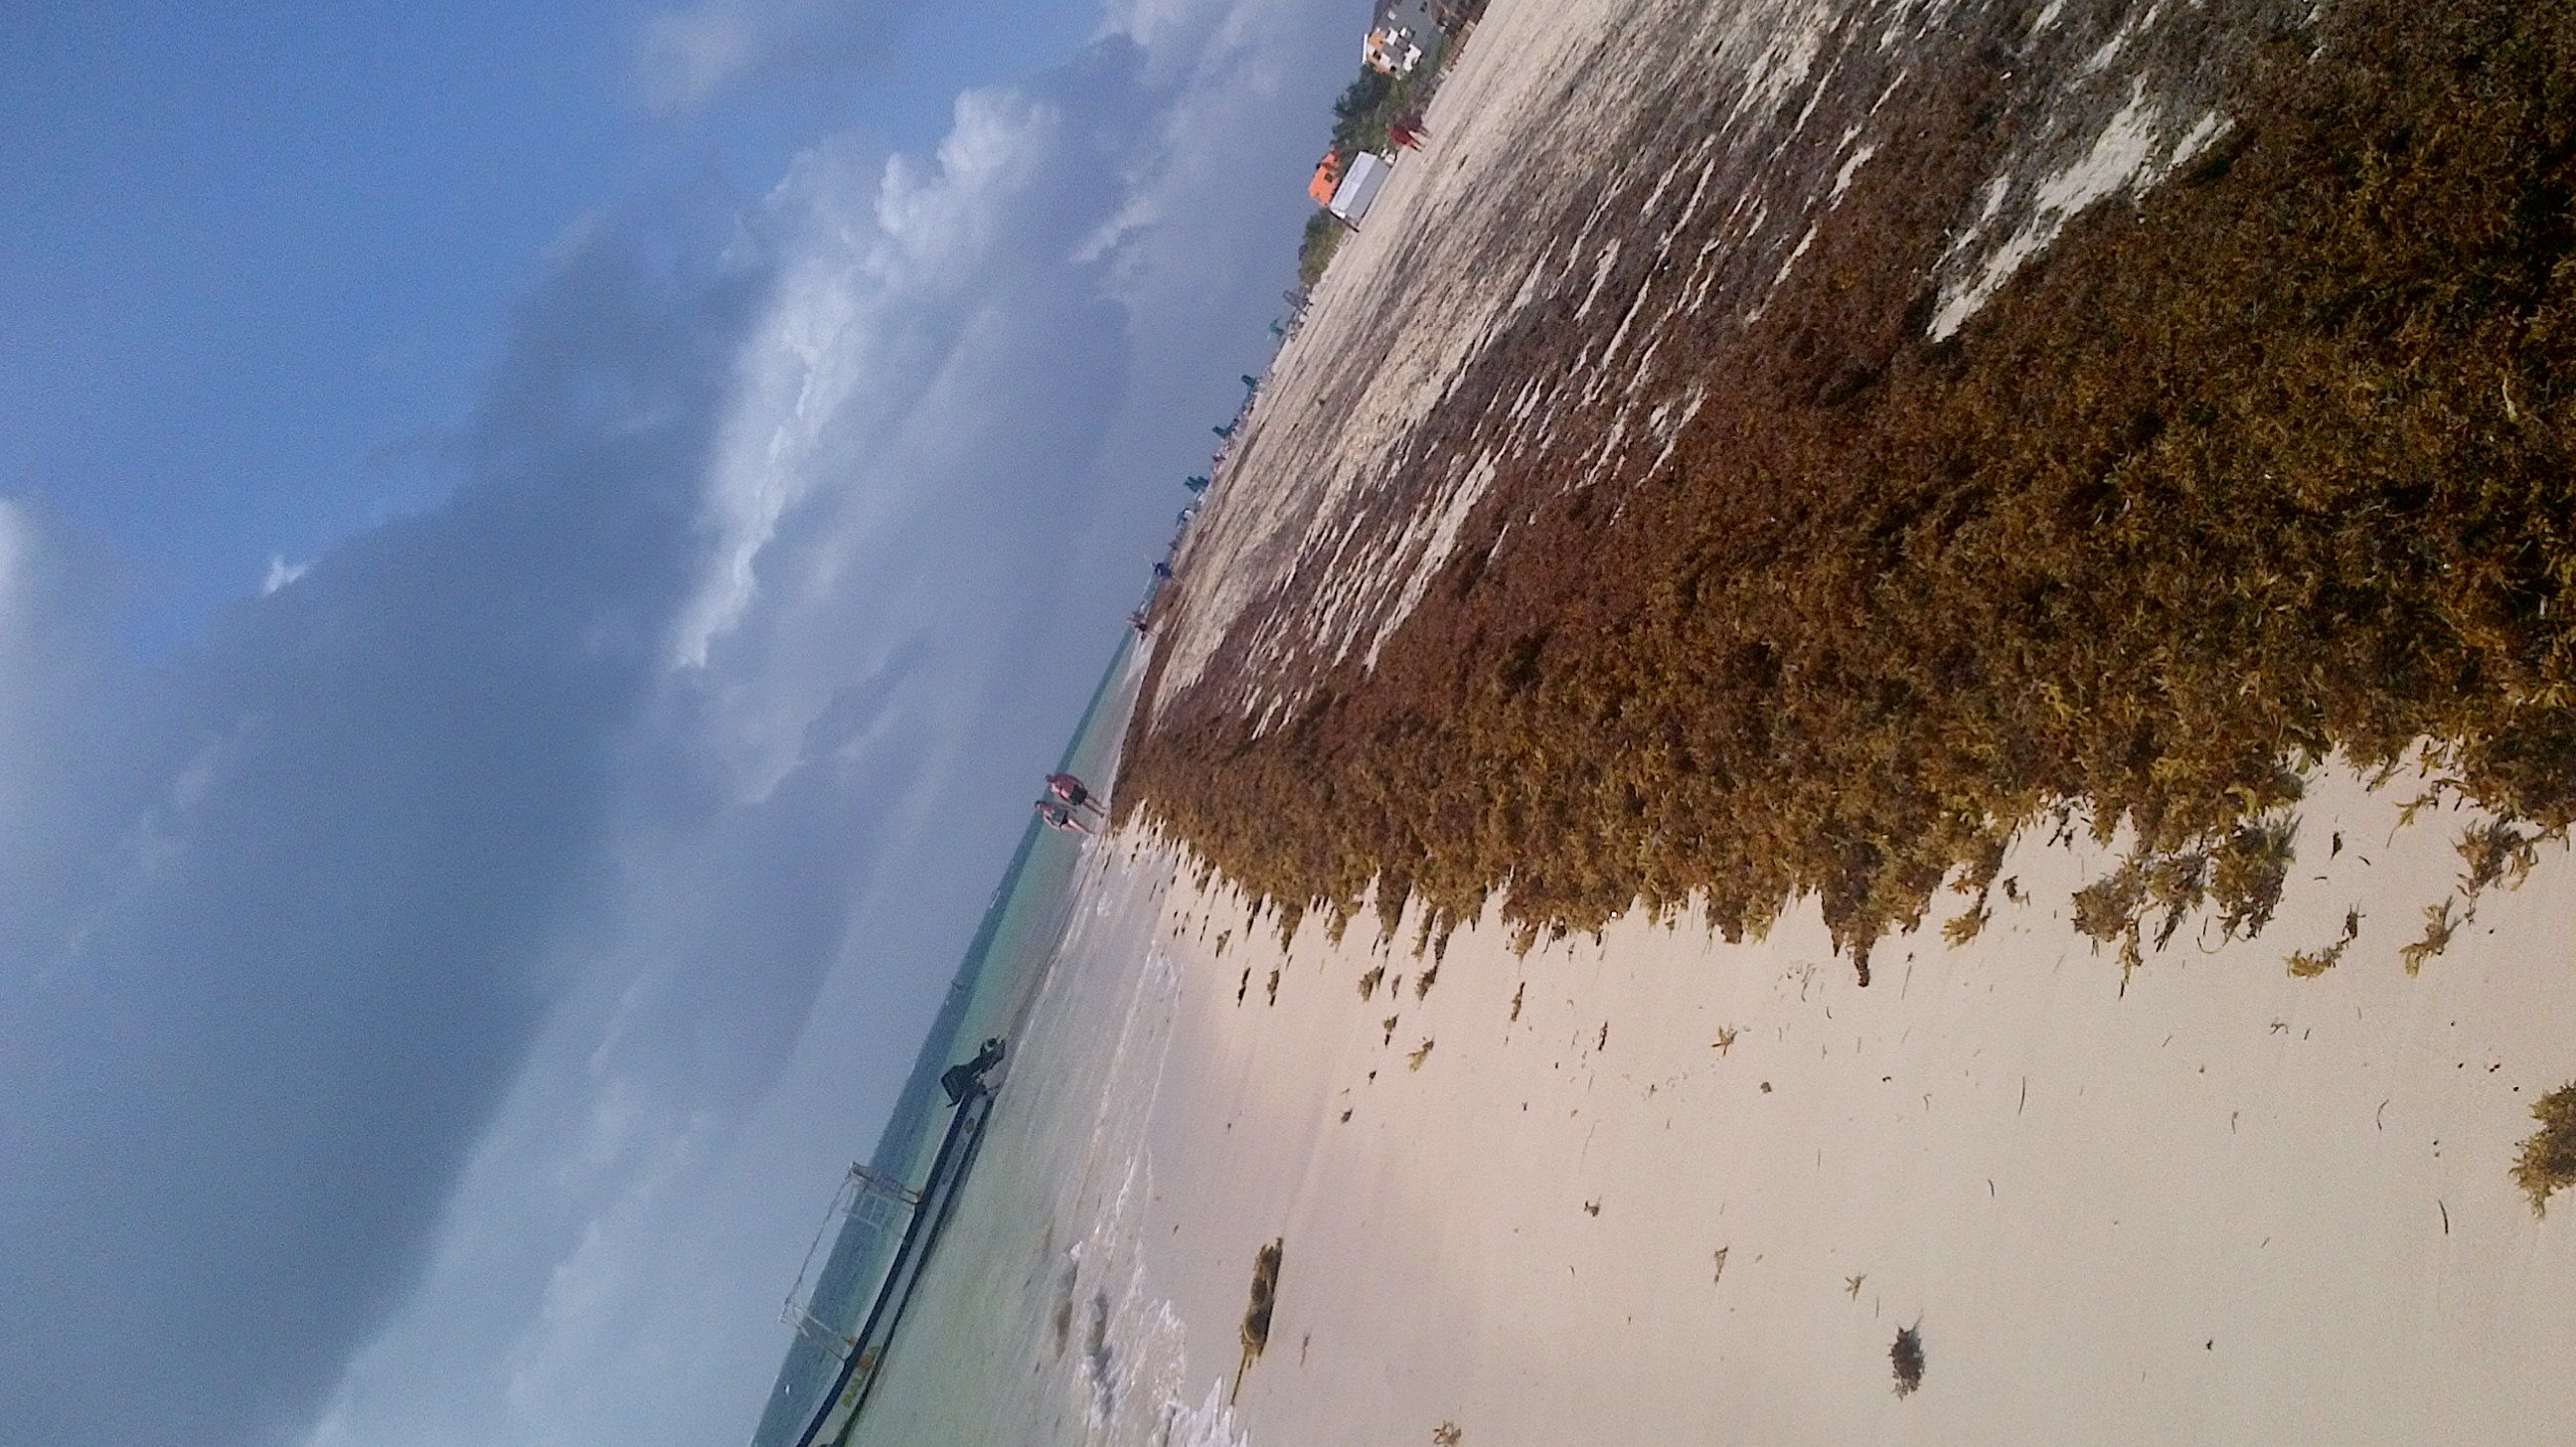 Sargasso grass - drifted in at beach Puerto Morelos Riviera May  (Sargassum)